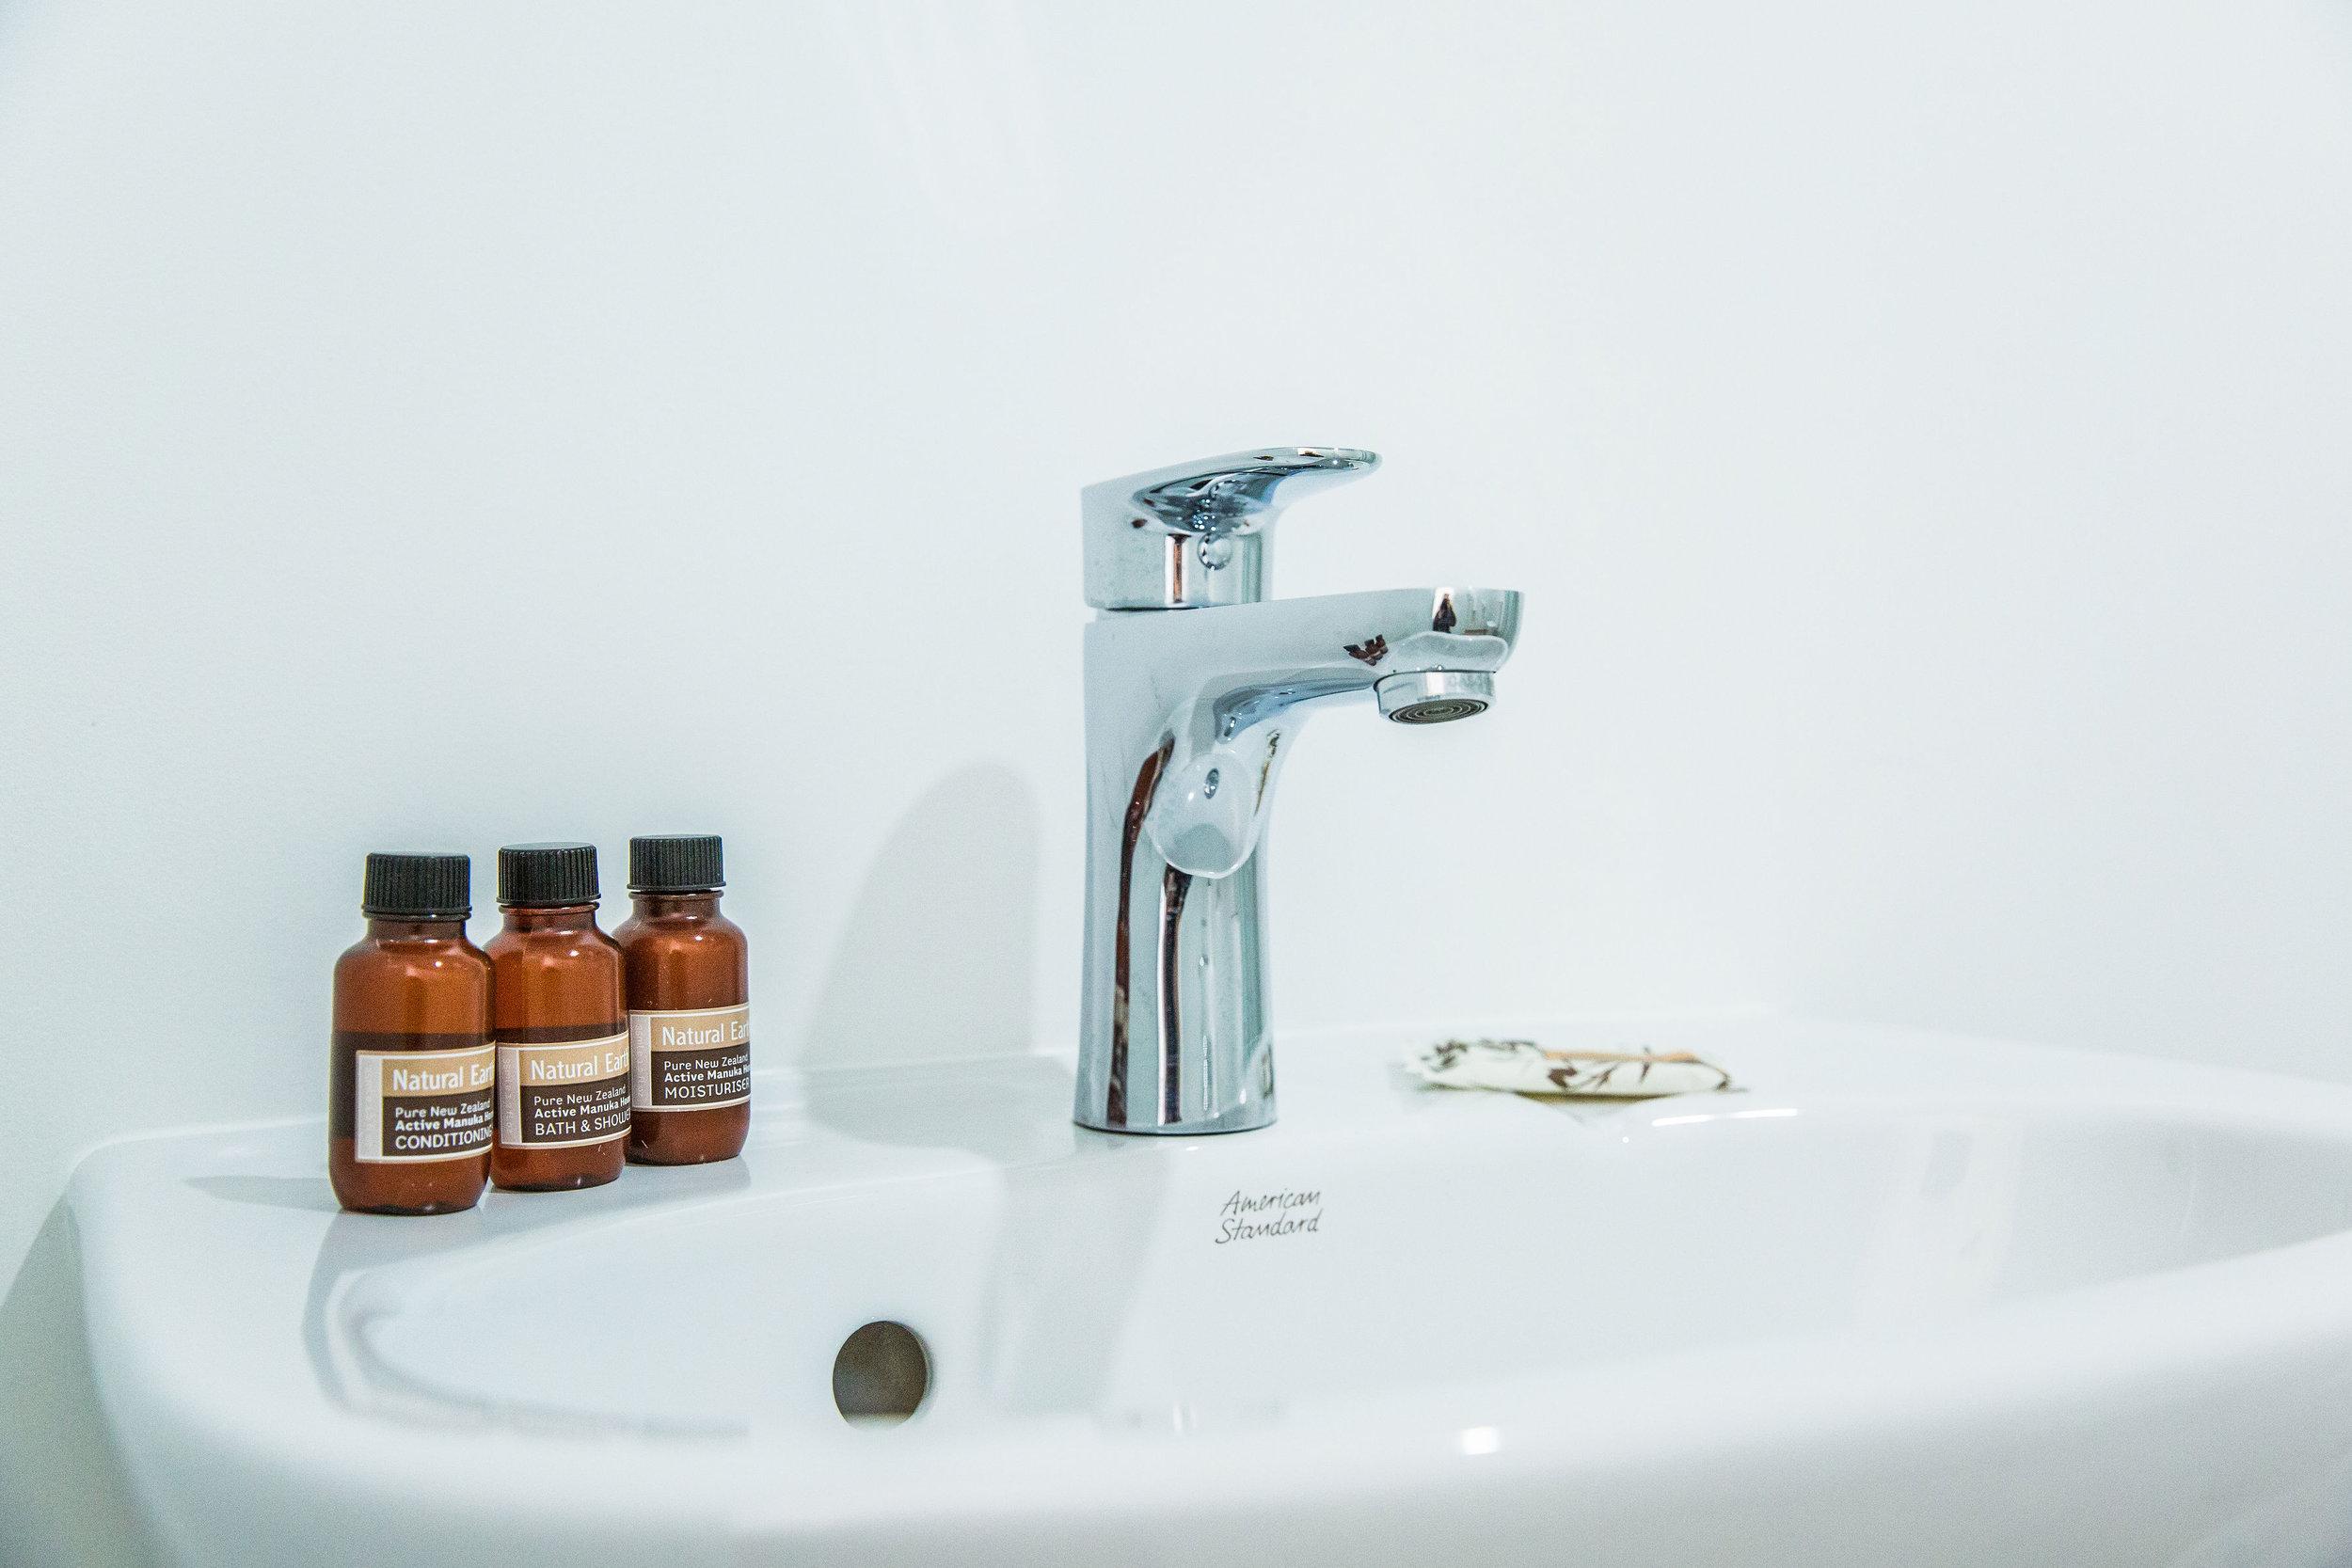 Bathroom Amenities - Eco friendly